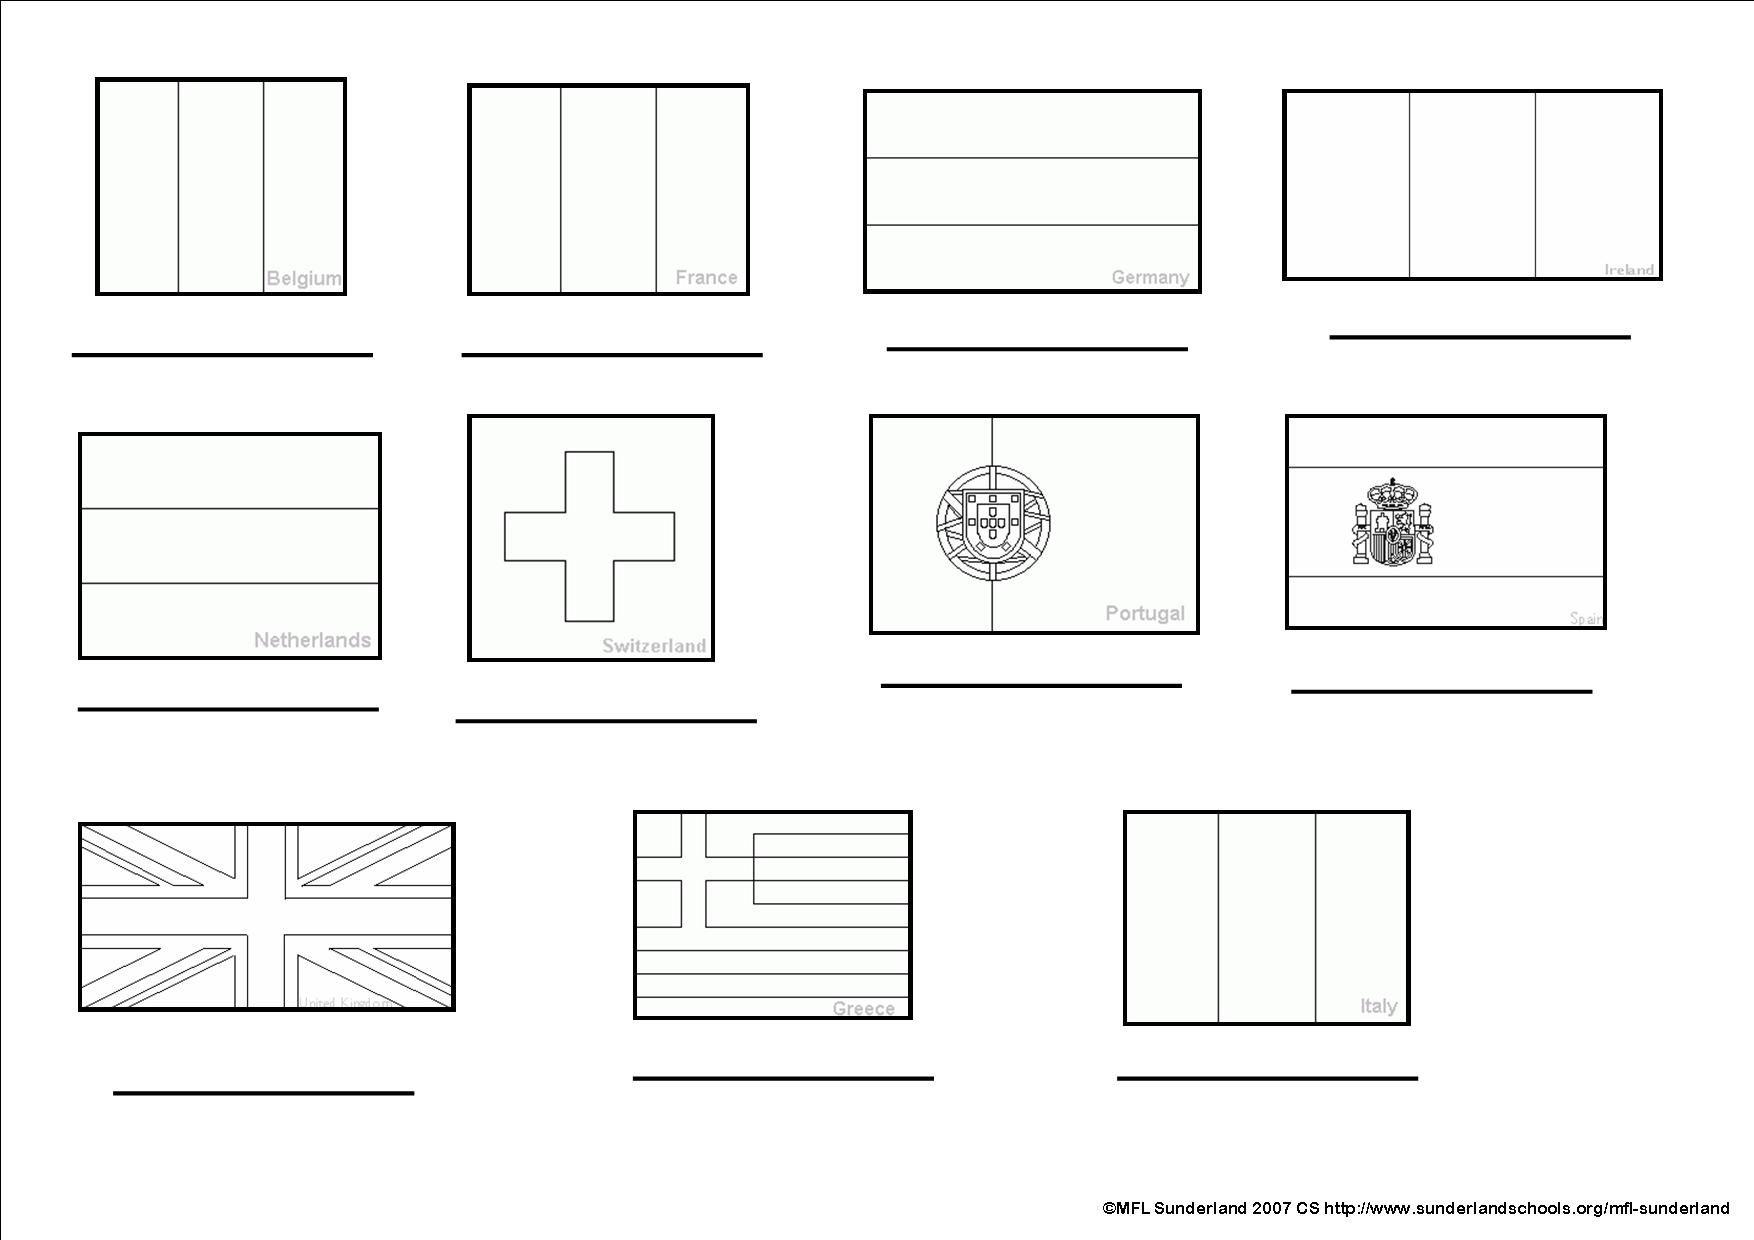 spks3pix8 (14×12)  flag coloring pages spanish